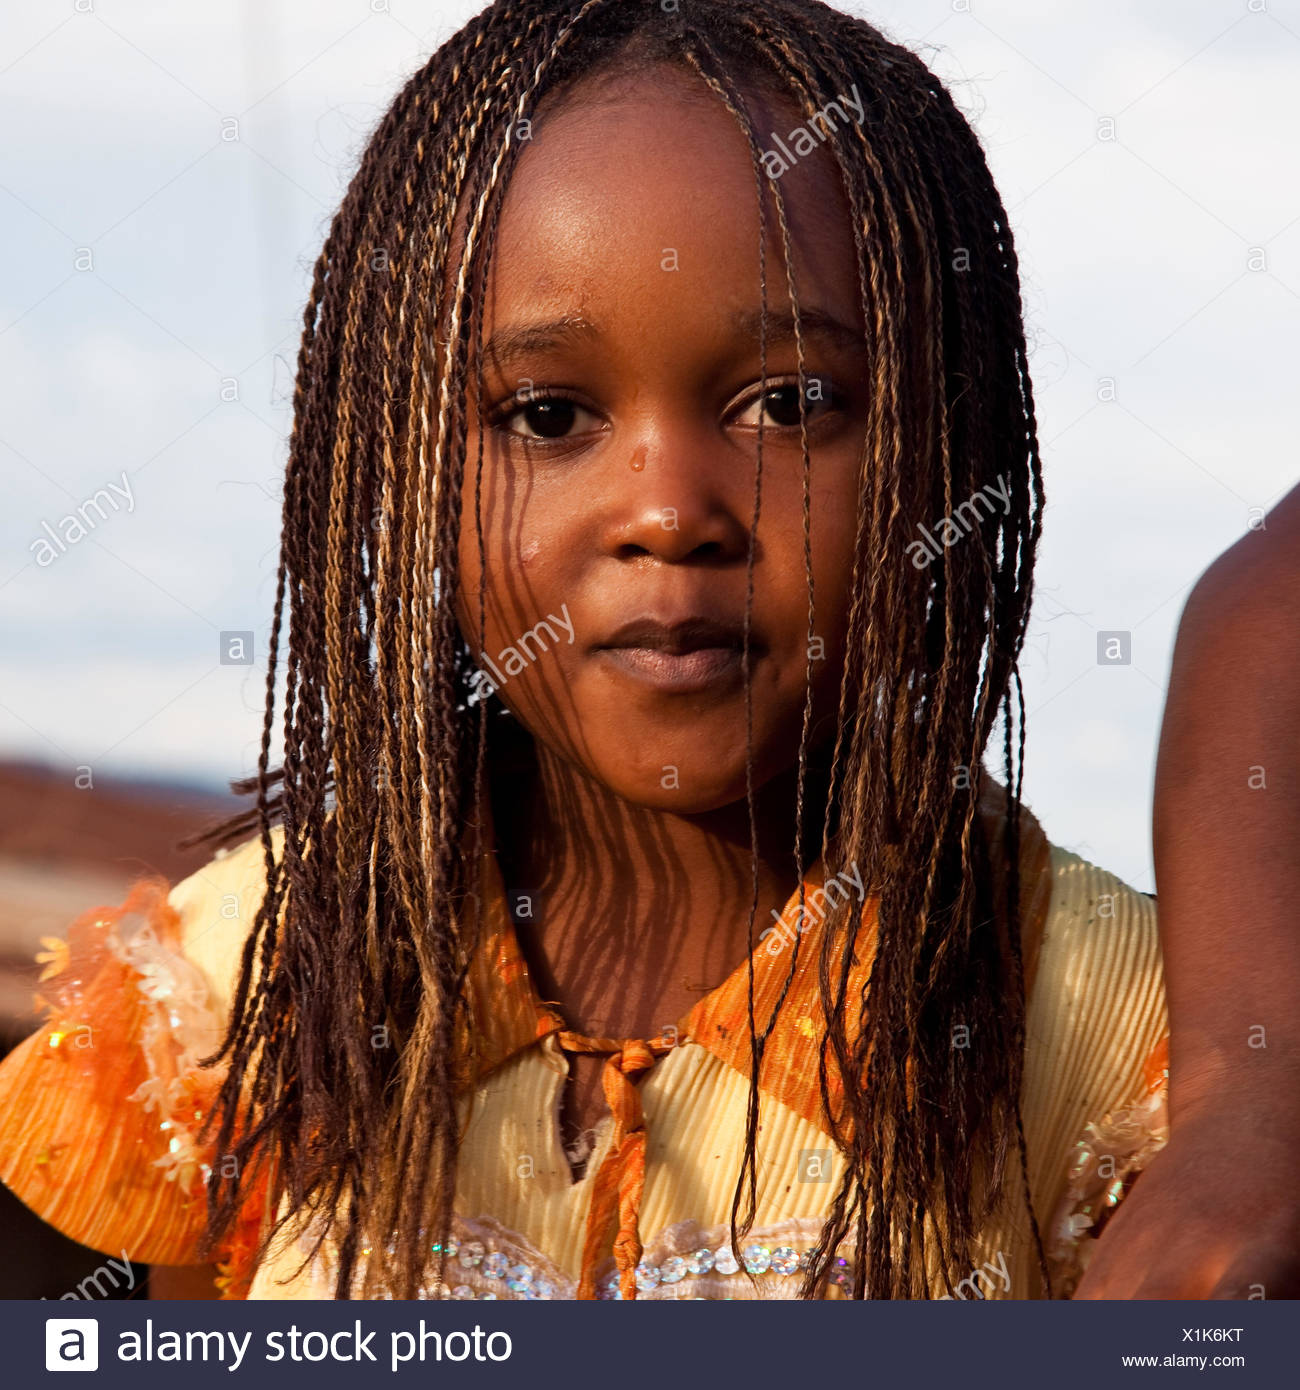 young girl with breaded hair, Rwanda, Nyamirambo, Kigali - Stock Image